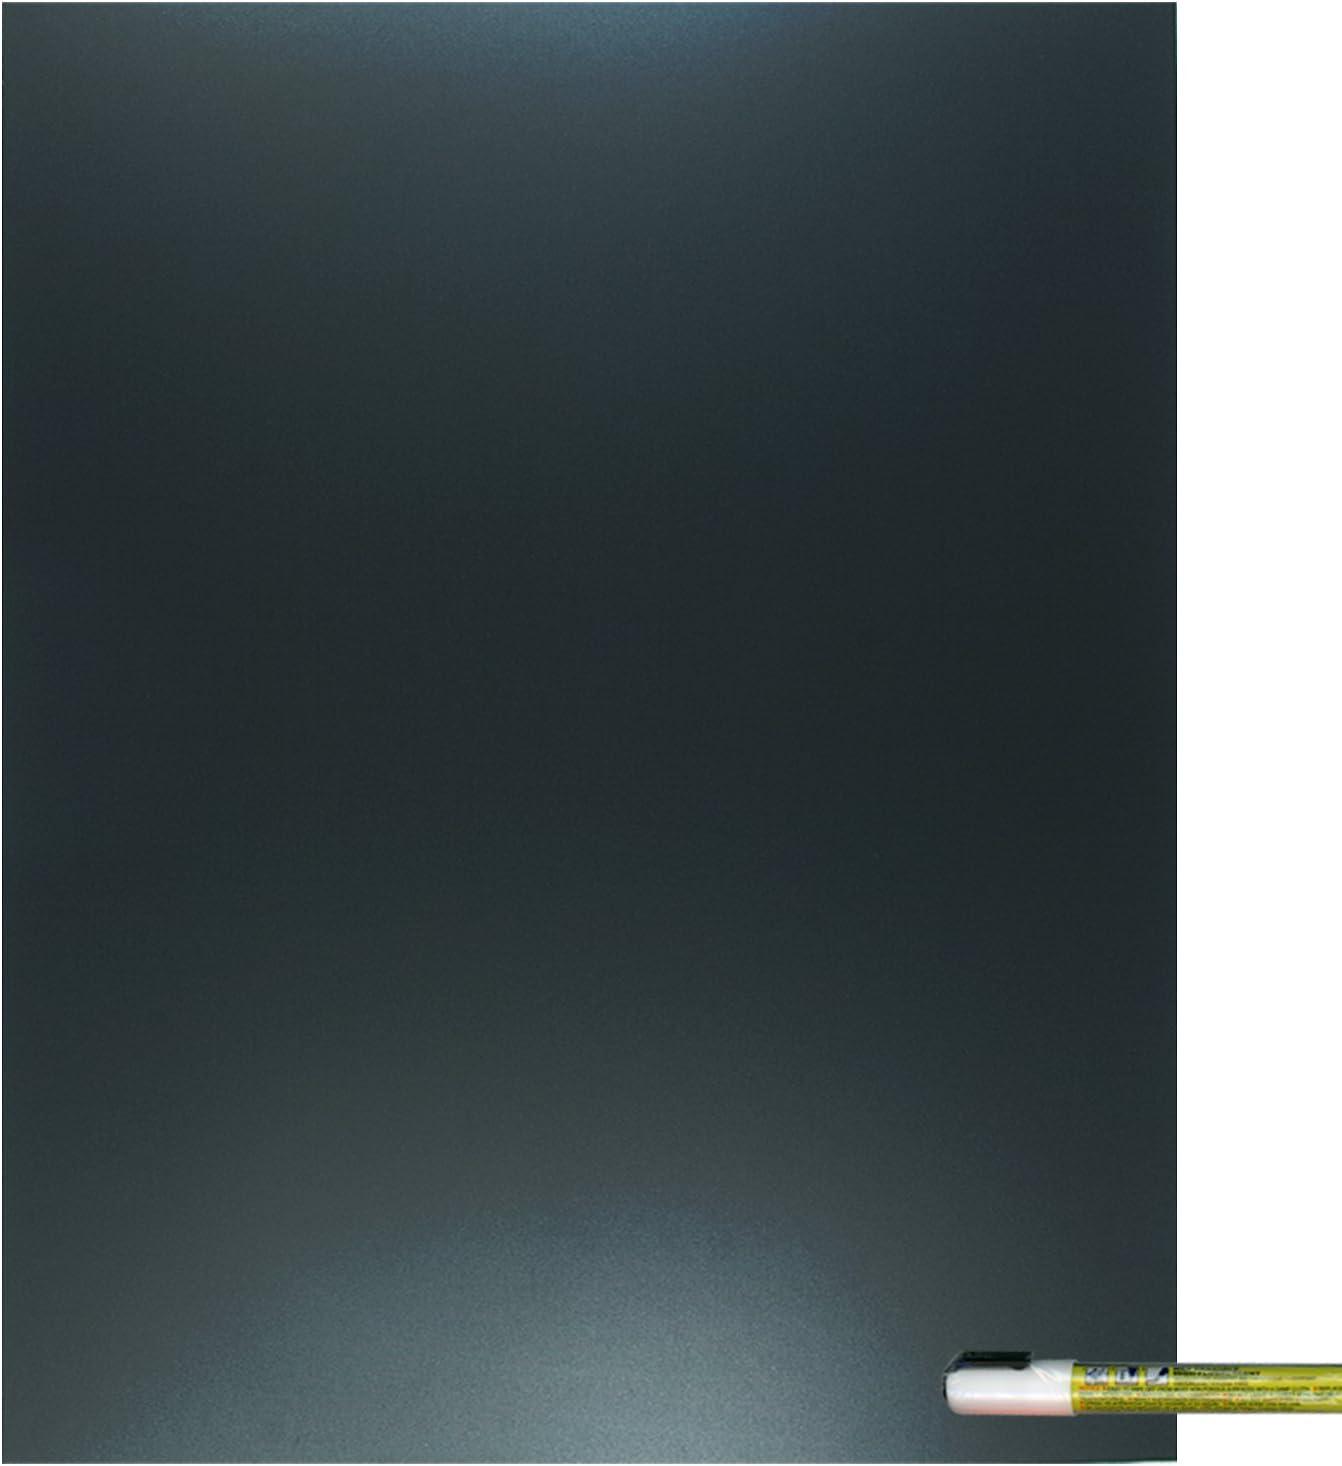 Cohas Eco Chalkboard Includes 1 Oklahoma City Mall Blackboard C Liquid and Unframed Ranking TOP3